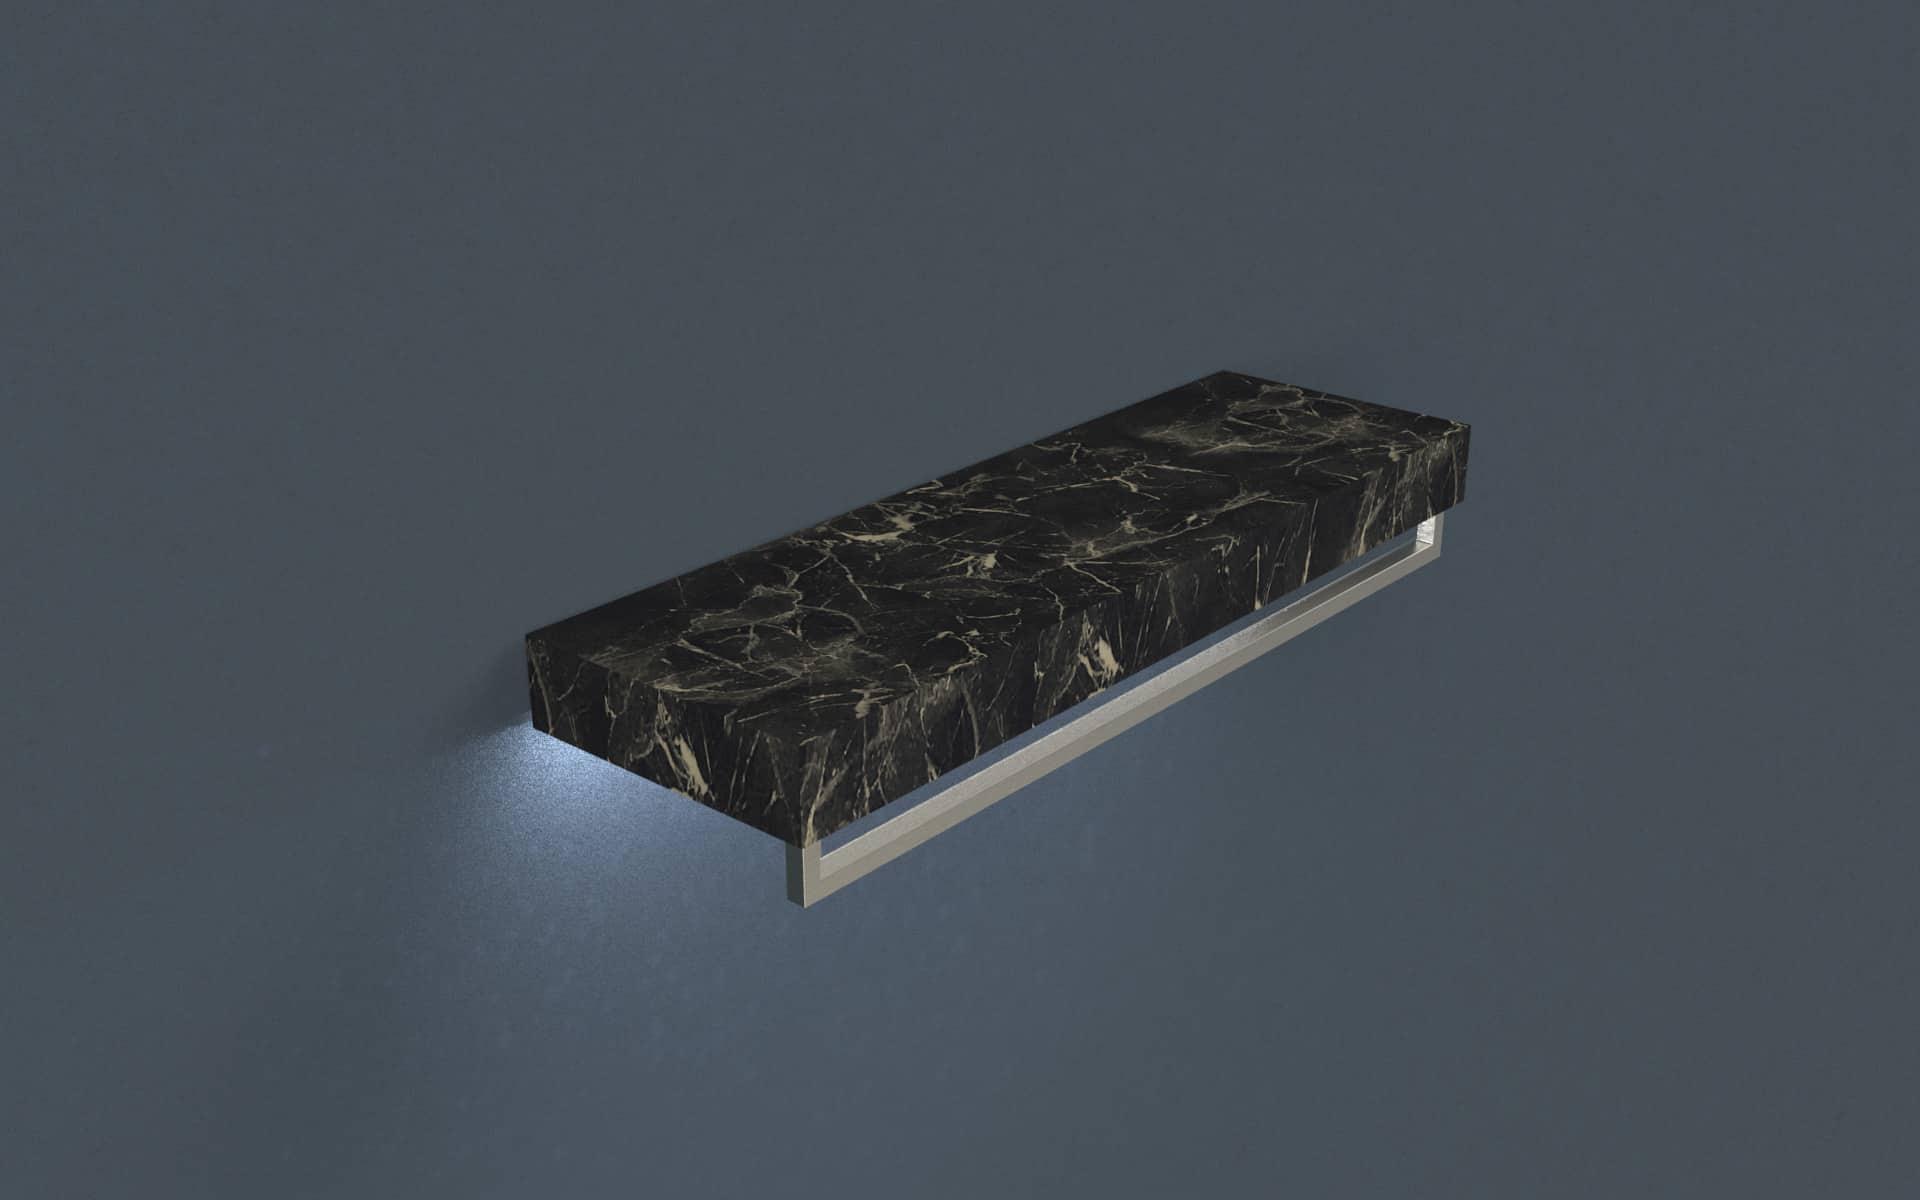 Shelf Monolith with hanging bar image 0